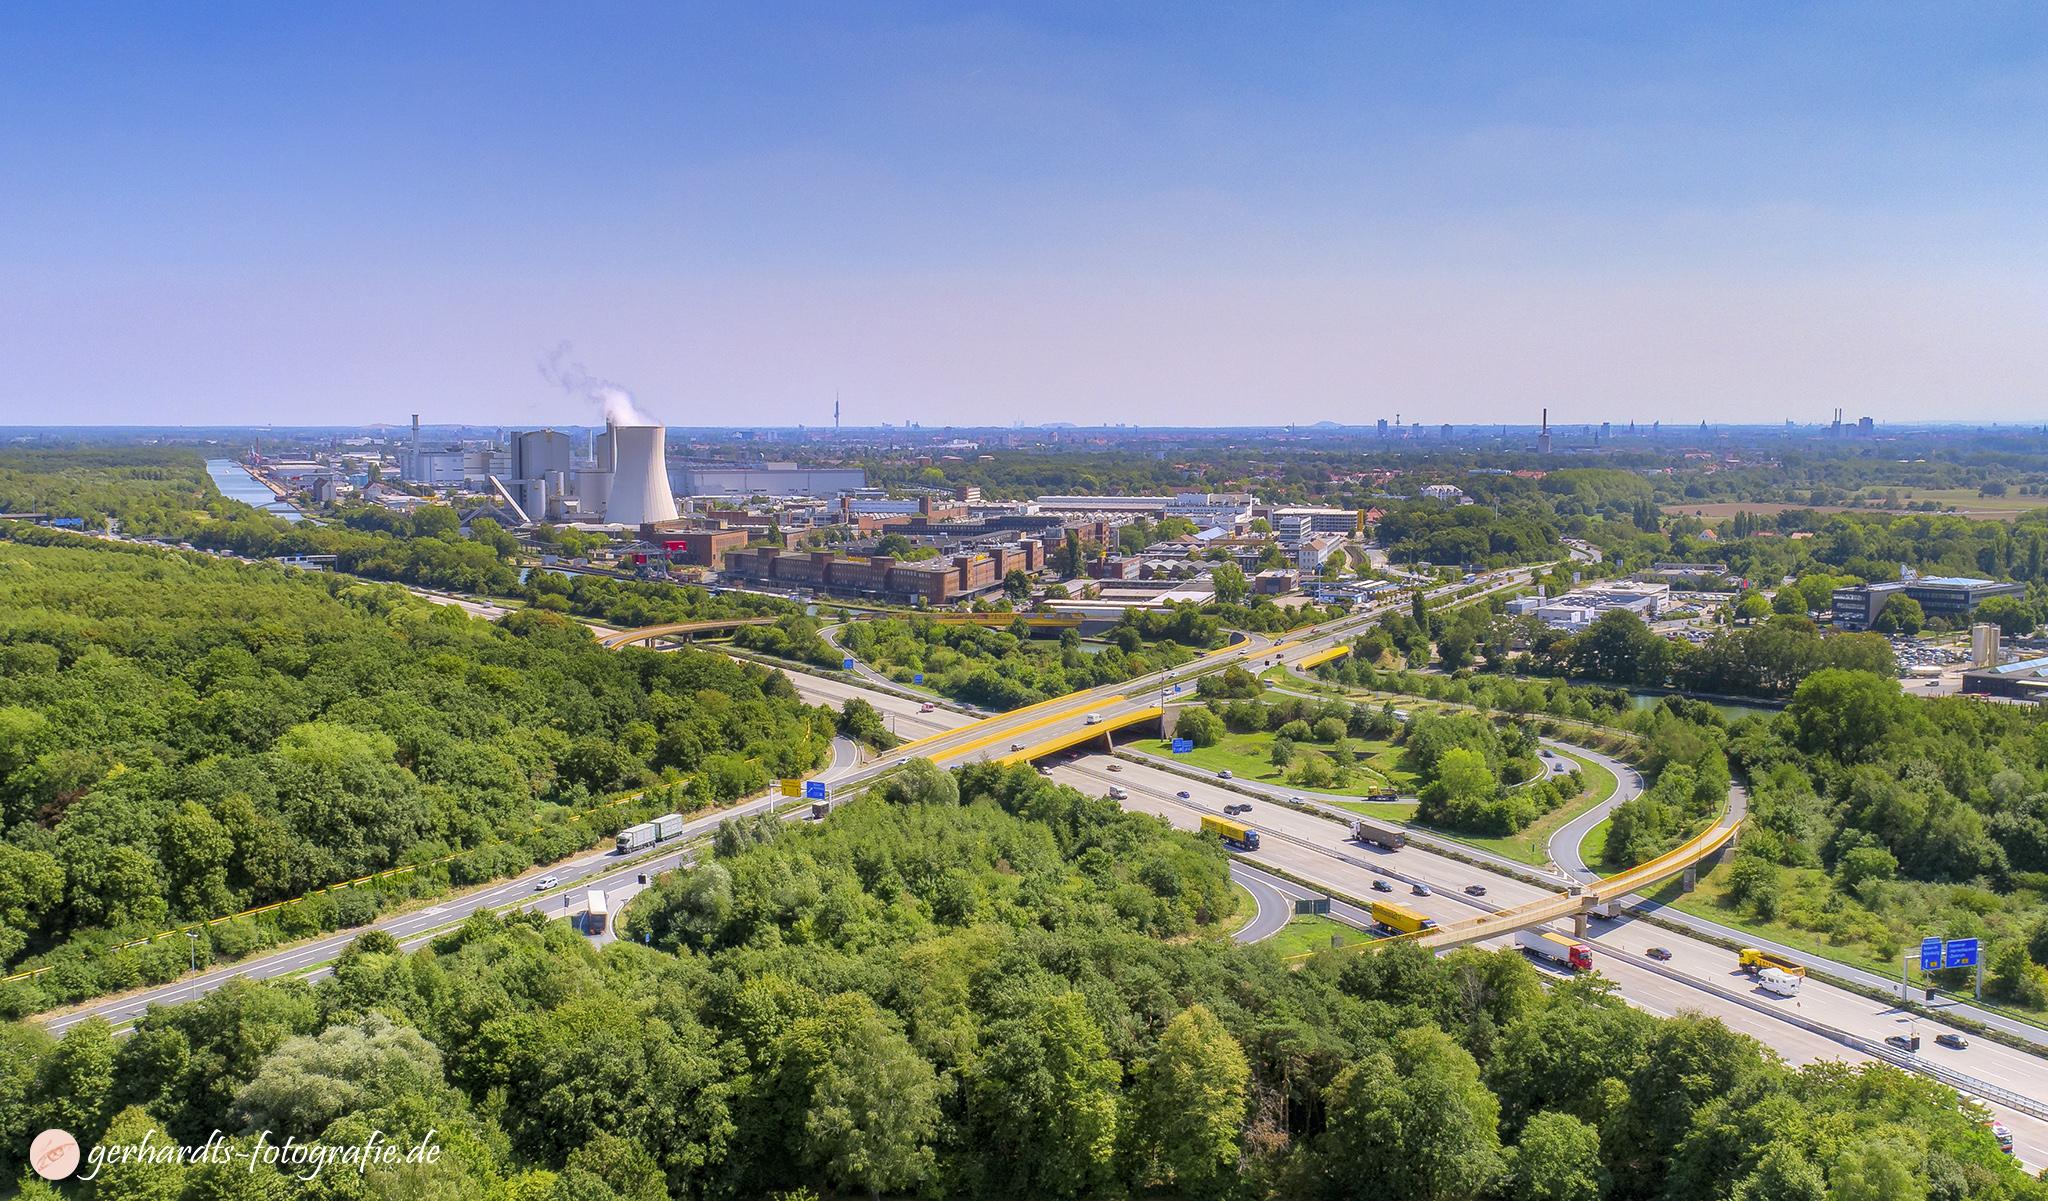 VW Nutzfahrzeuge | Johnson Controls Hannover Luftbild - Luftbildfotografie Göttingen